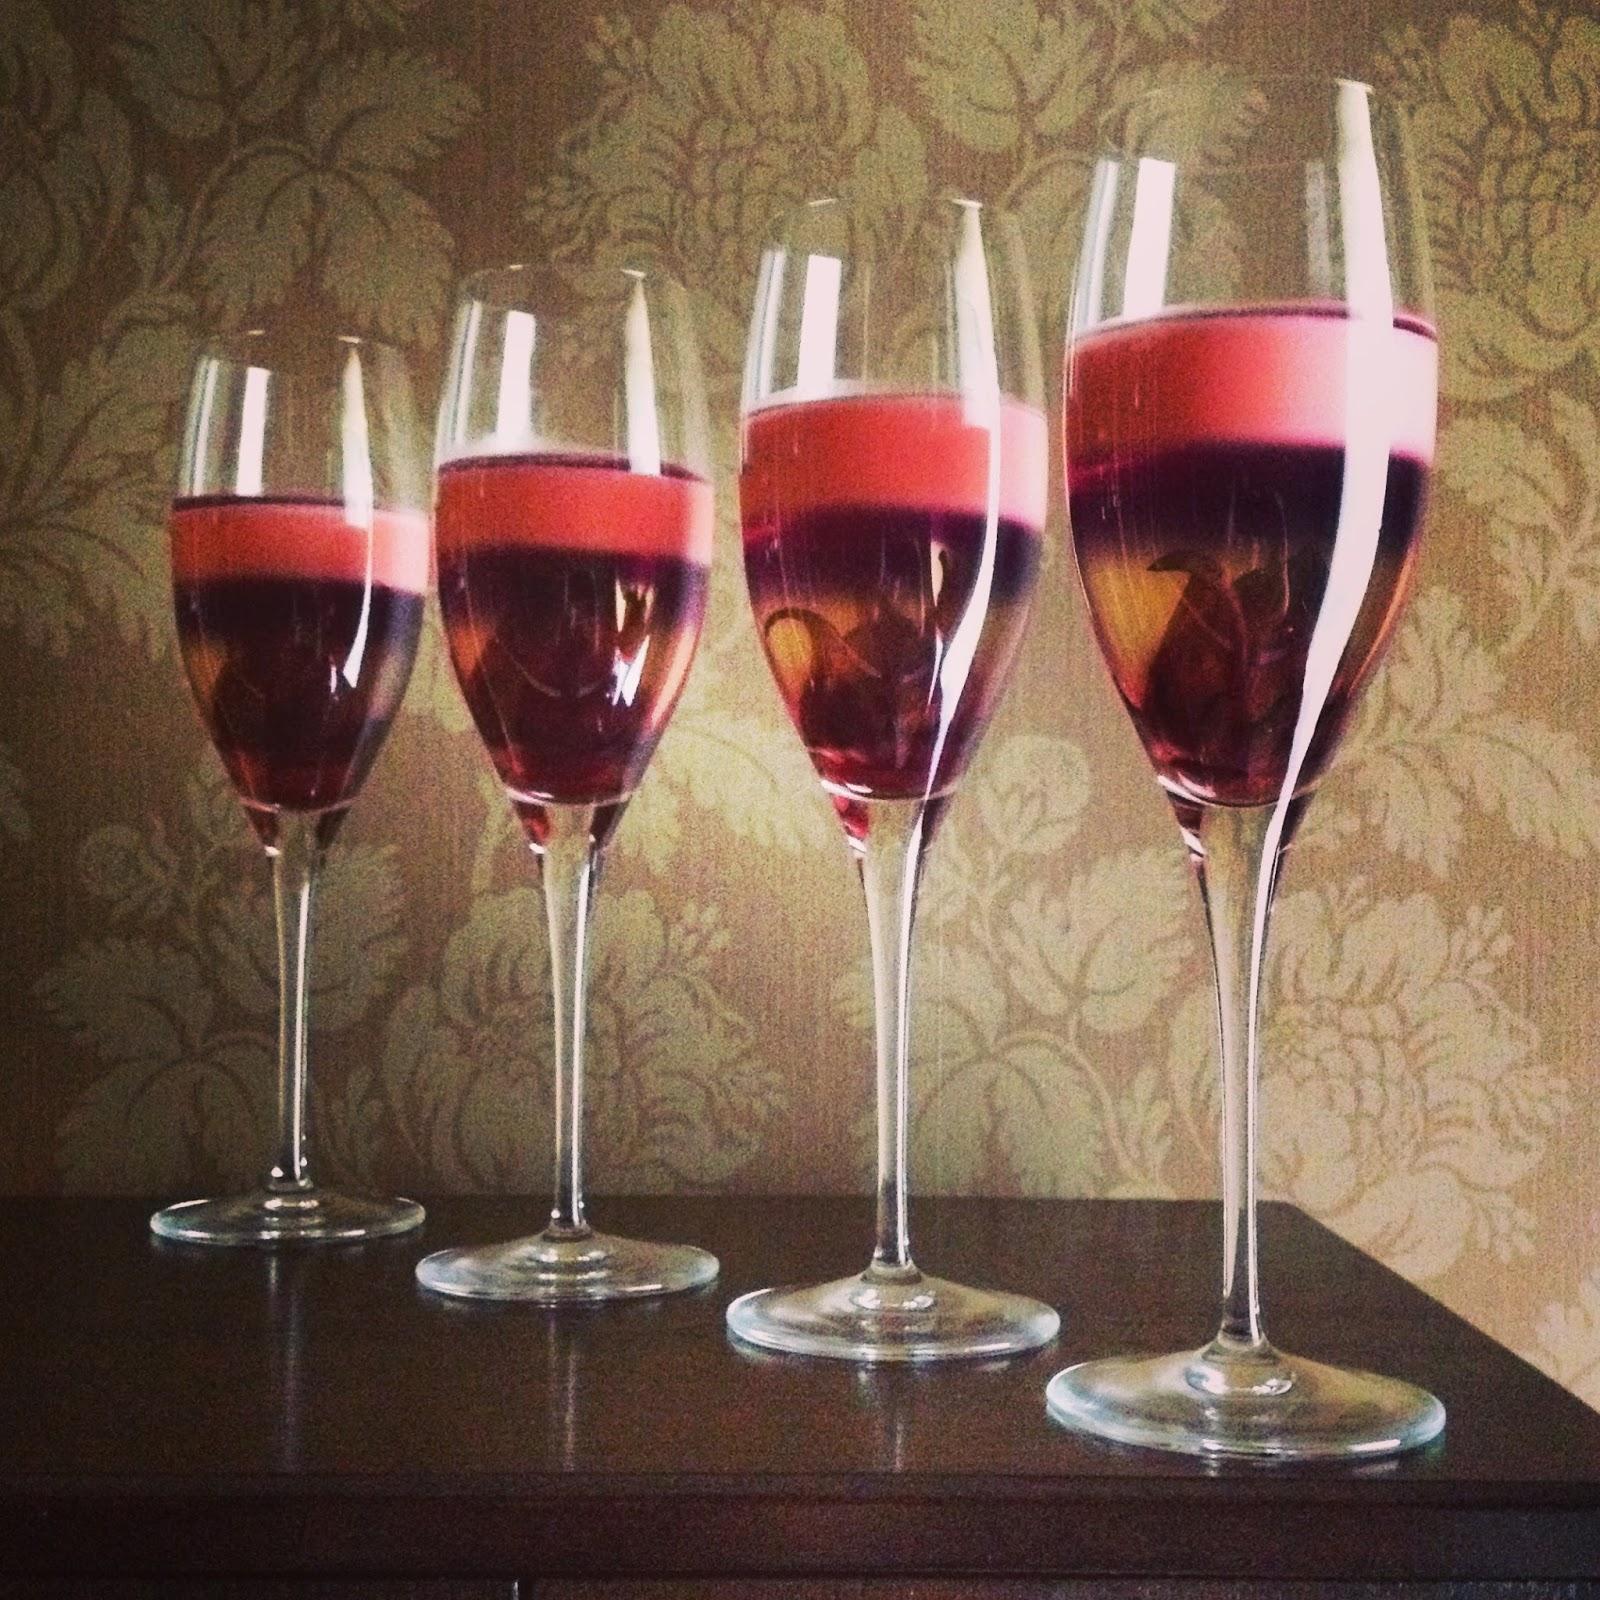 37 Cooks Champagne Hibiscus Gelatine